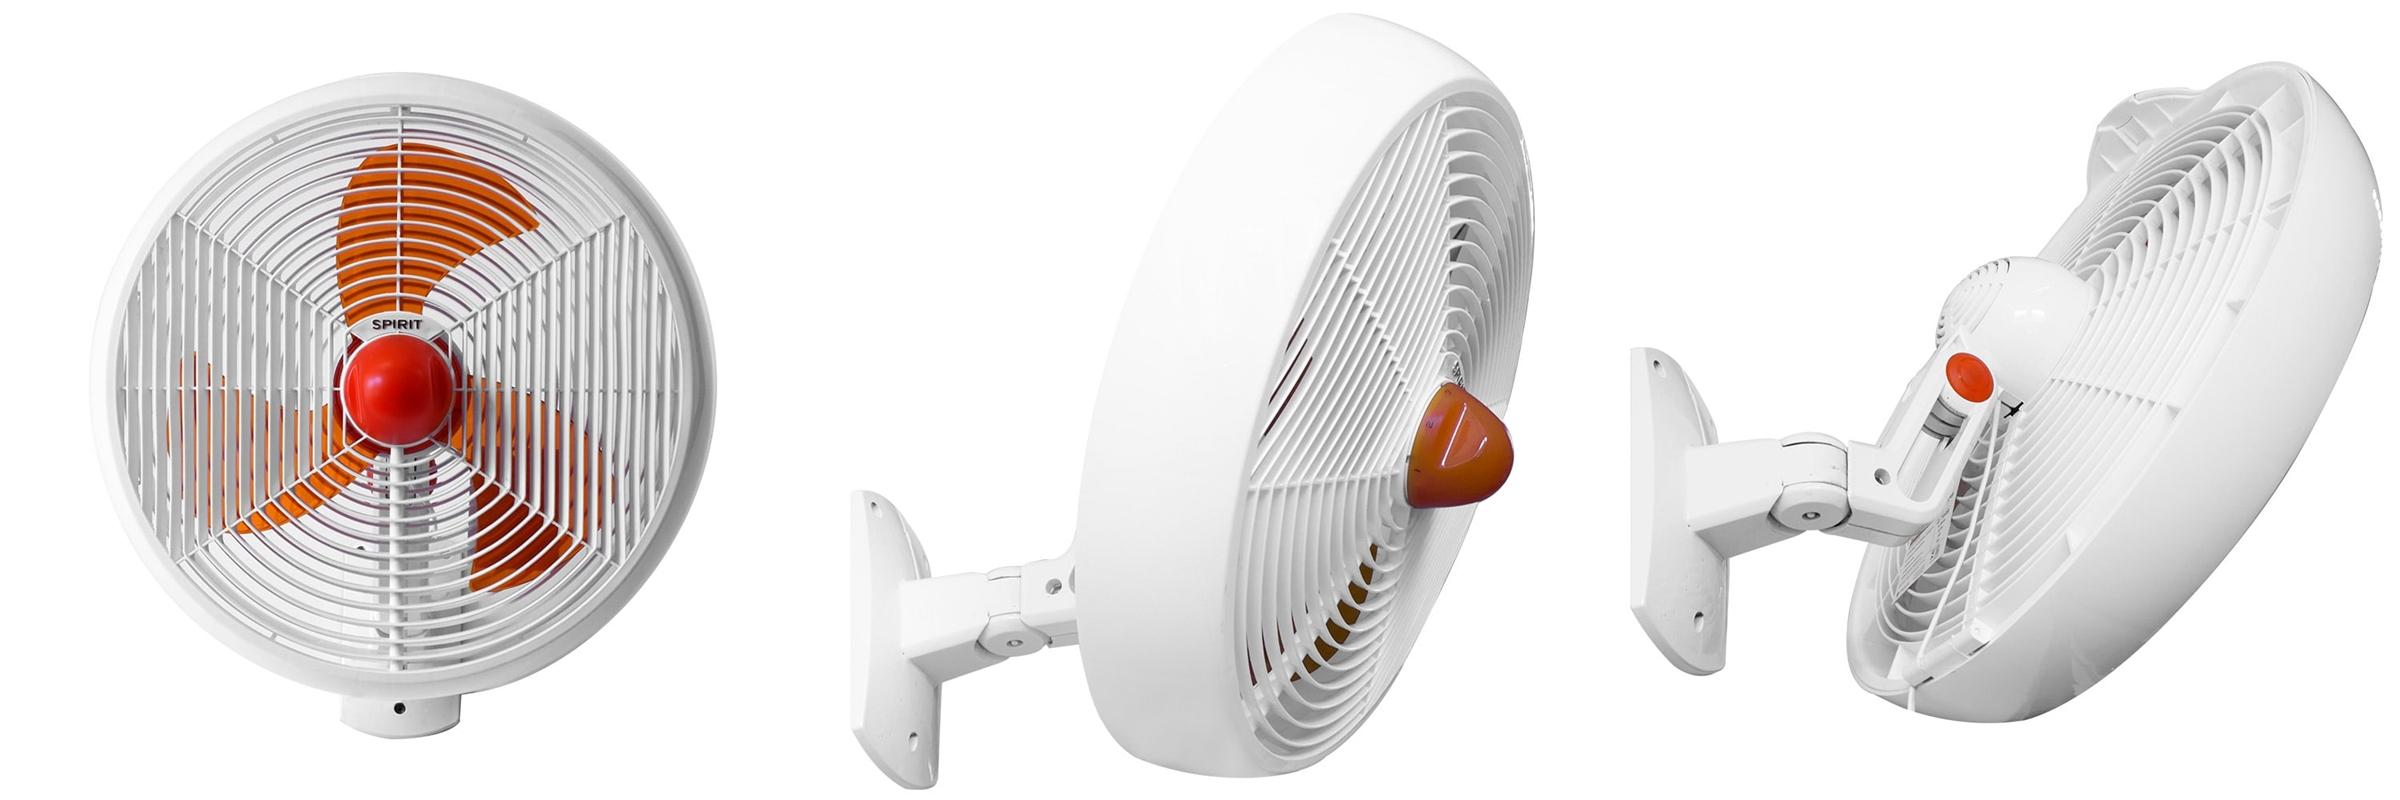 ventilador de teto Spirit - Blog Myspirit - Ventilador de Parede SPIRIT Maxximos 40cm Tangerine - ventilador de parede Spirit - ventilador de parede